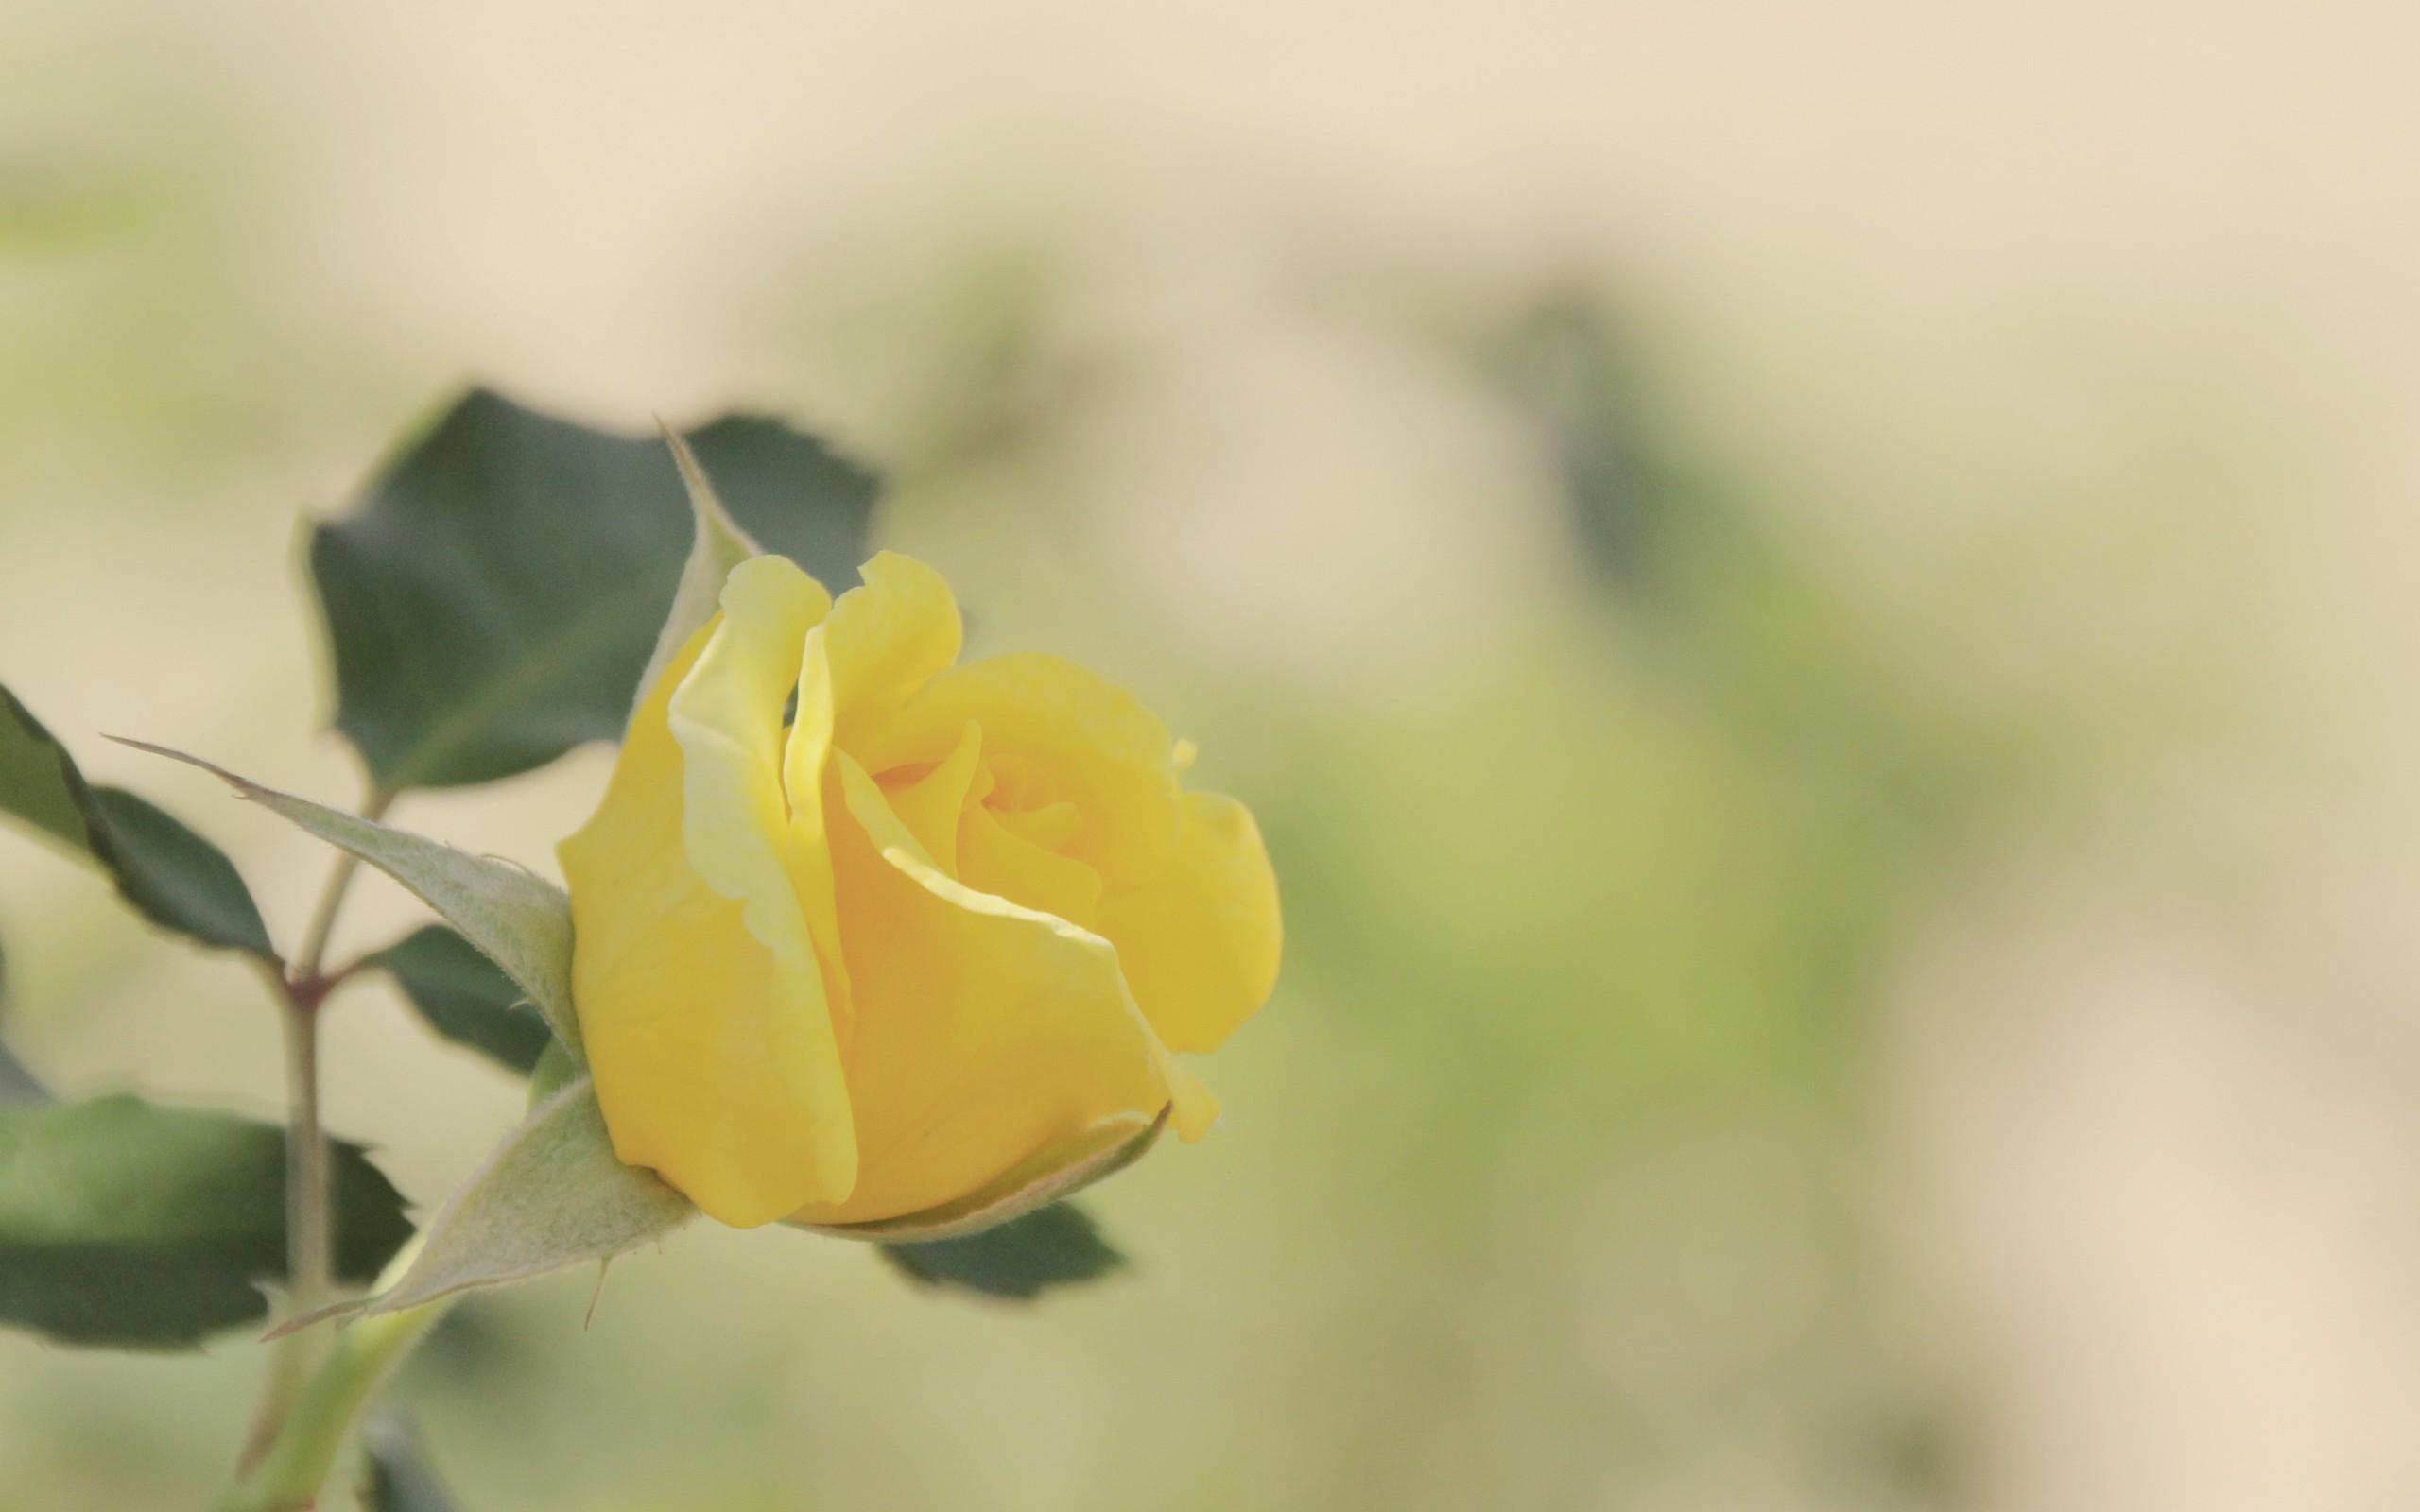 yellow rose wallpaper 46811 2560x1600 px